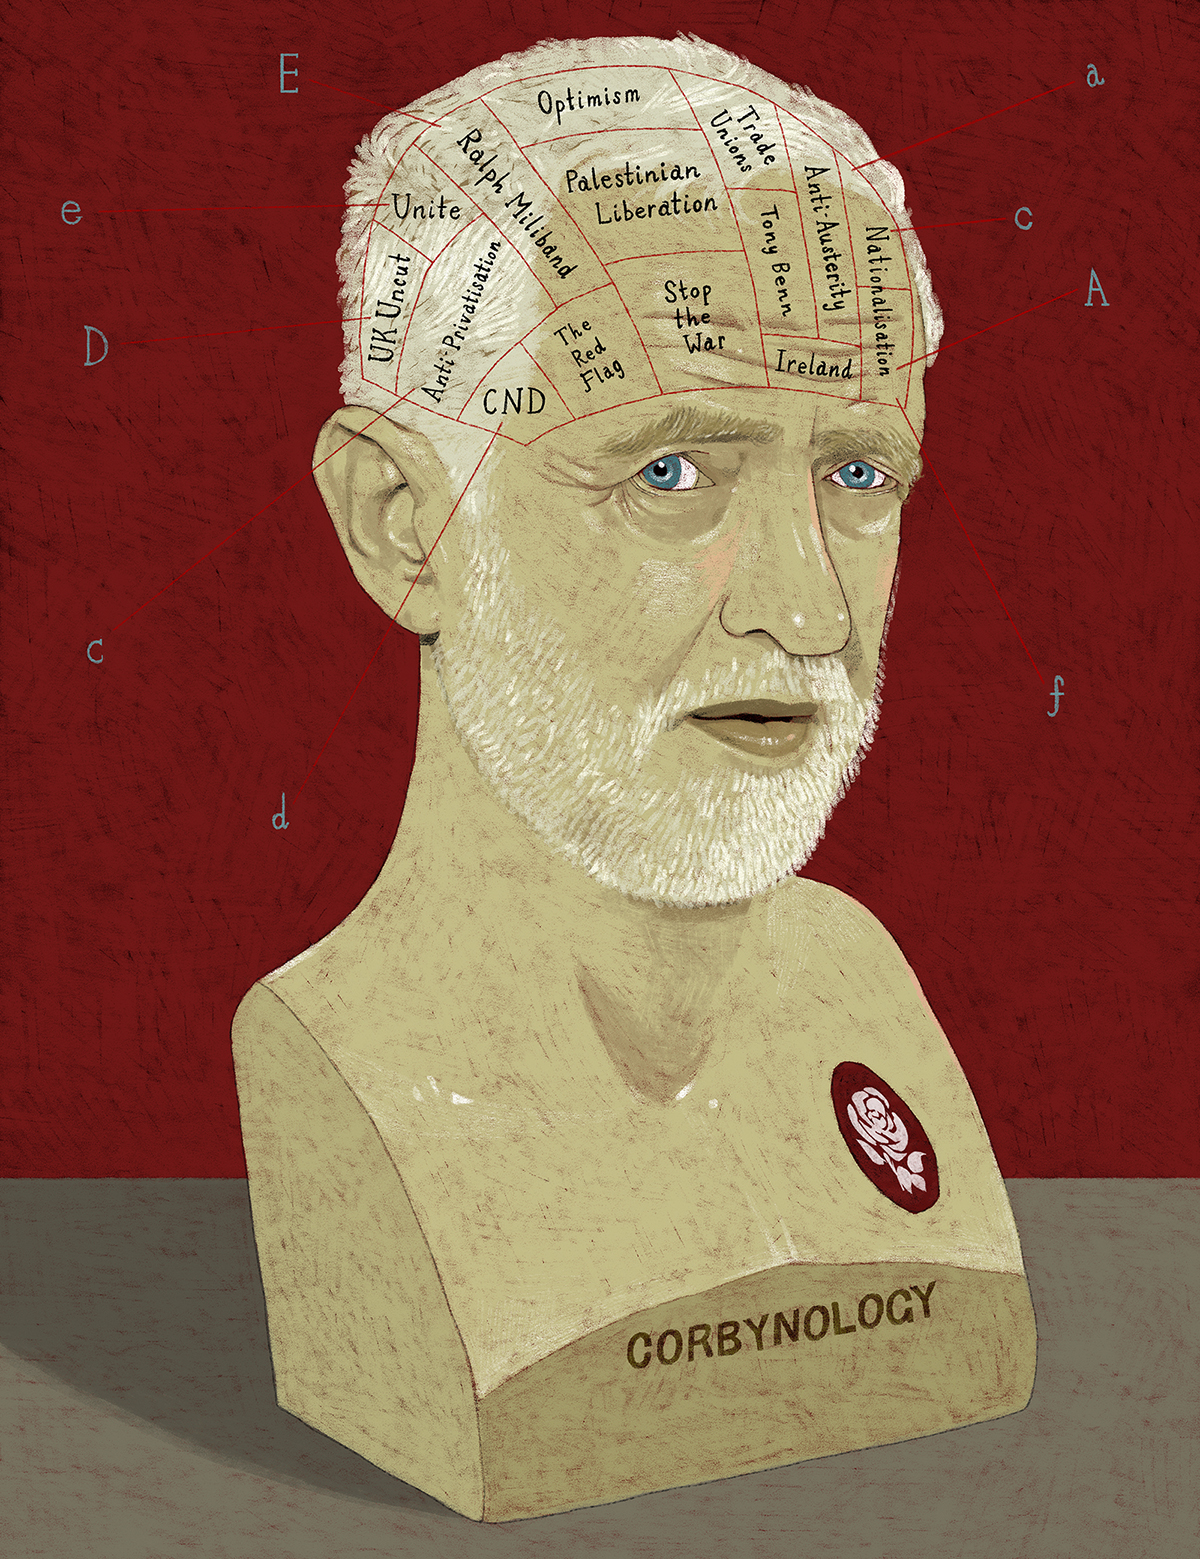 rebecca-hendin-new-statesman-jeremy-corbyn-phrenology-head-illustration-3-USE-1200